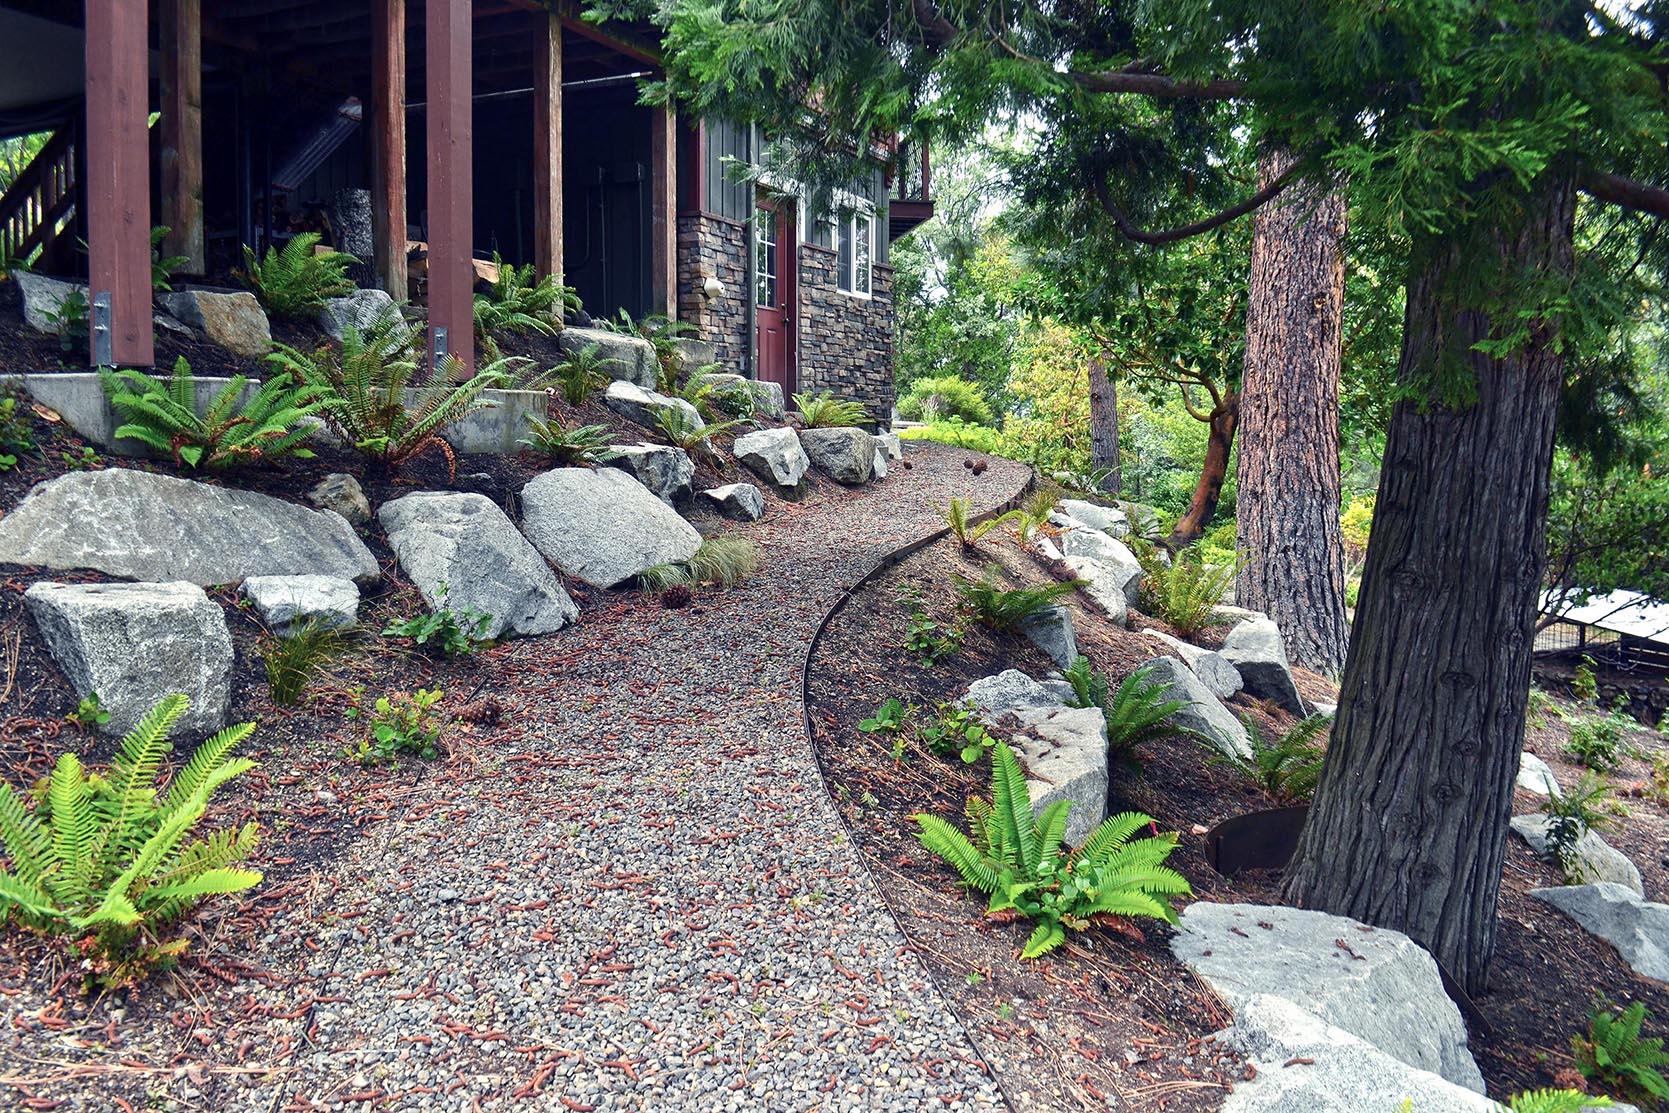 Gravel Pathway Through Native Conifers + Understory Ferns + Granite Boulders